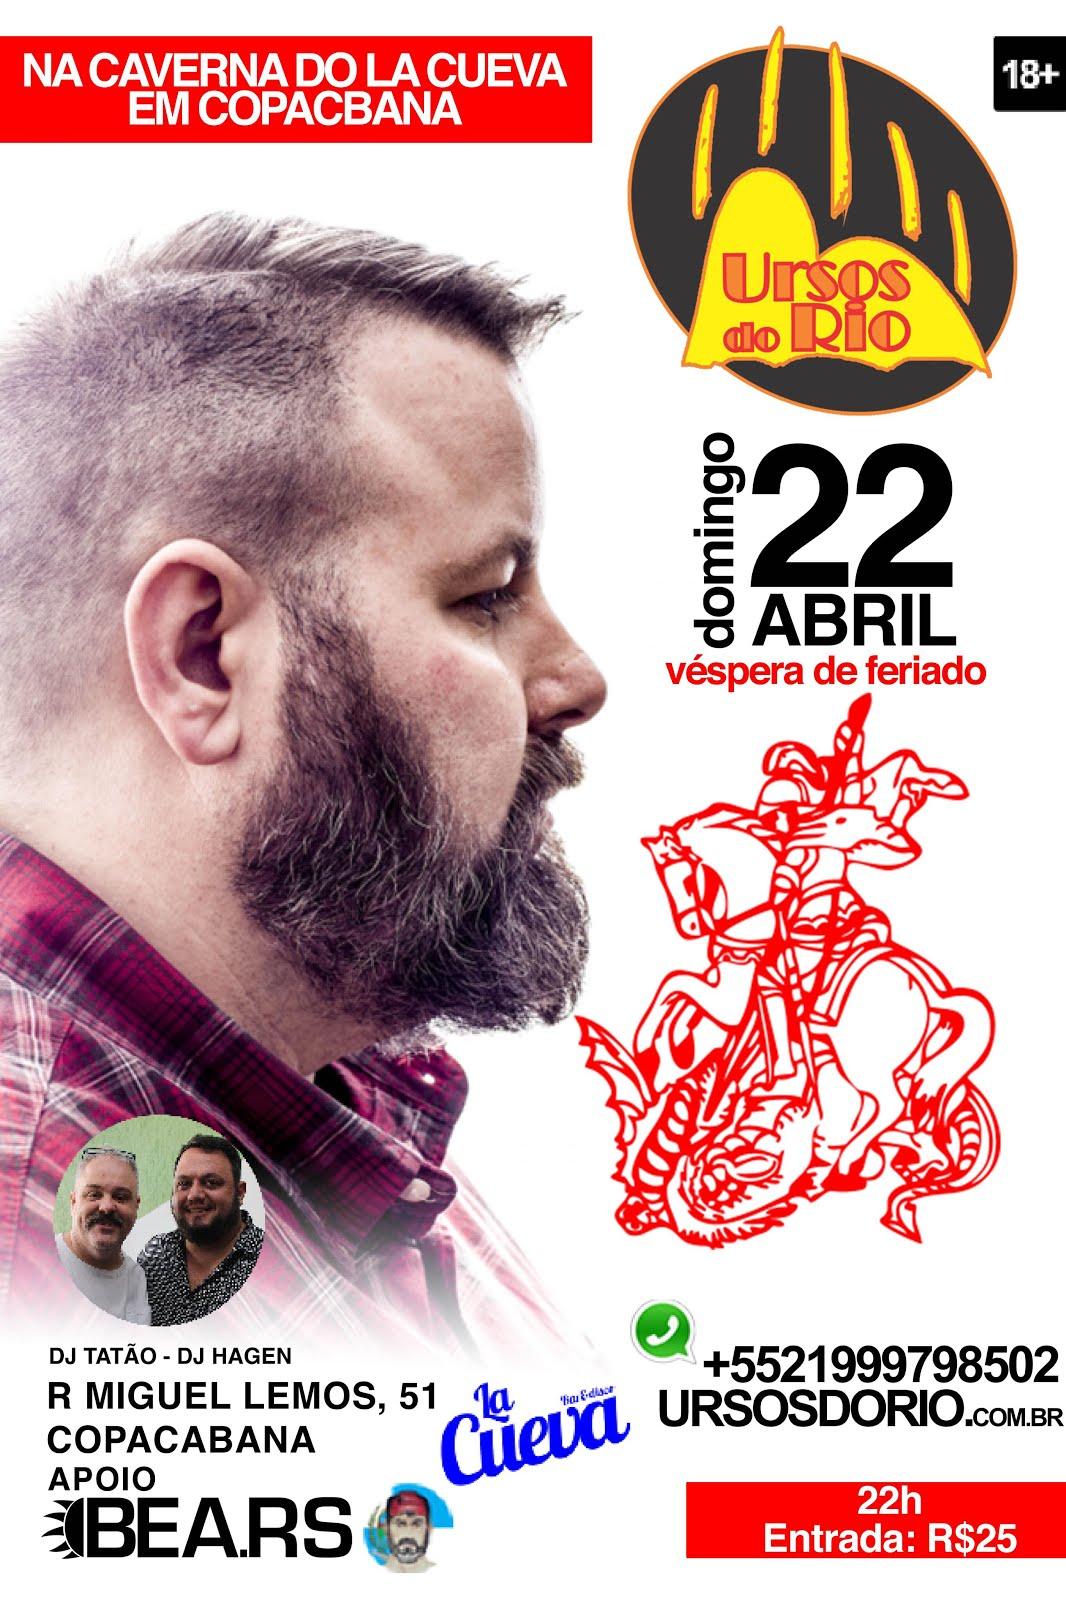 DOMINGO - 22/04 - 20H